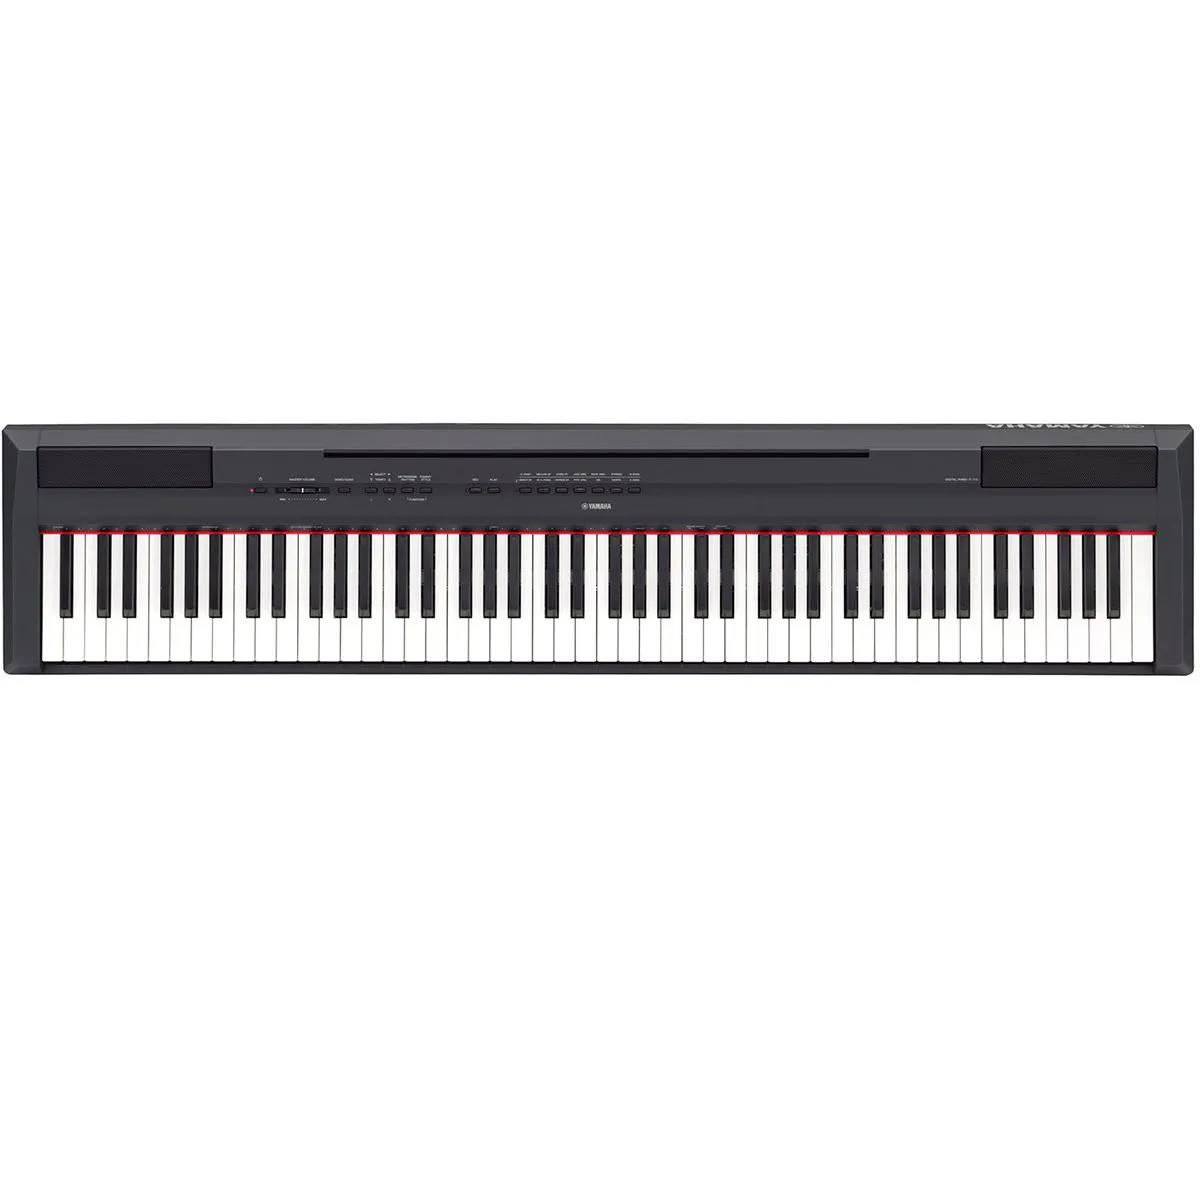 Piano Digital Yamaha P115 Graded Hammer Standard Black 88 Teclas